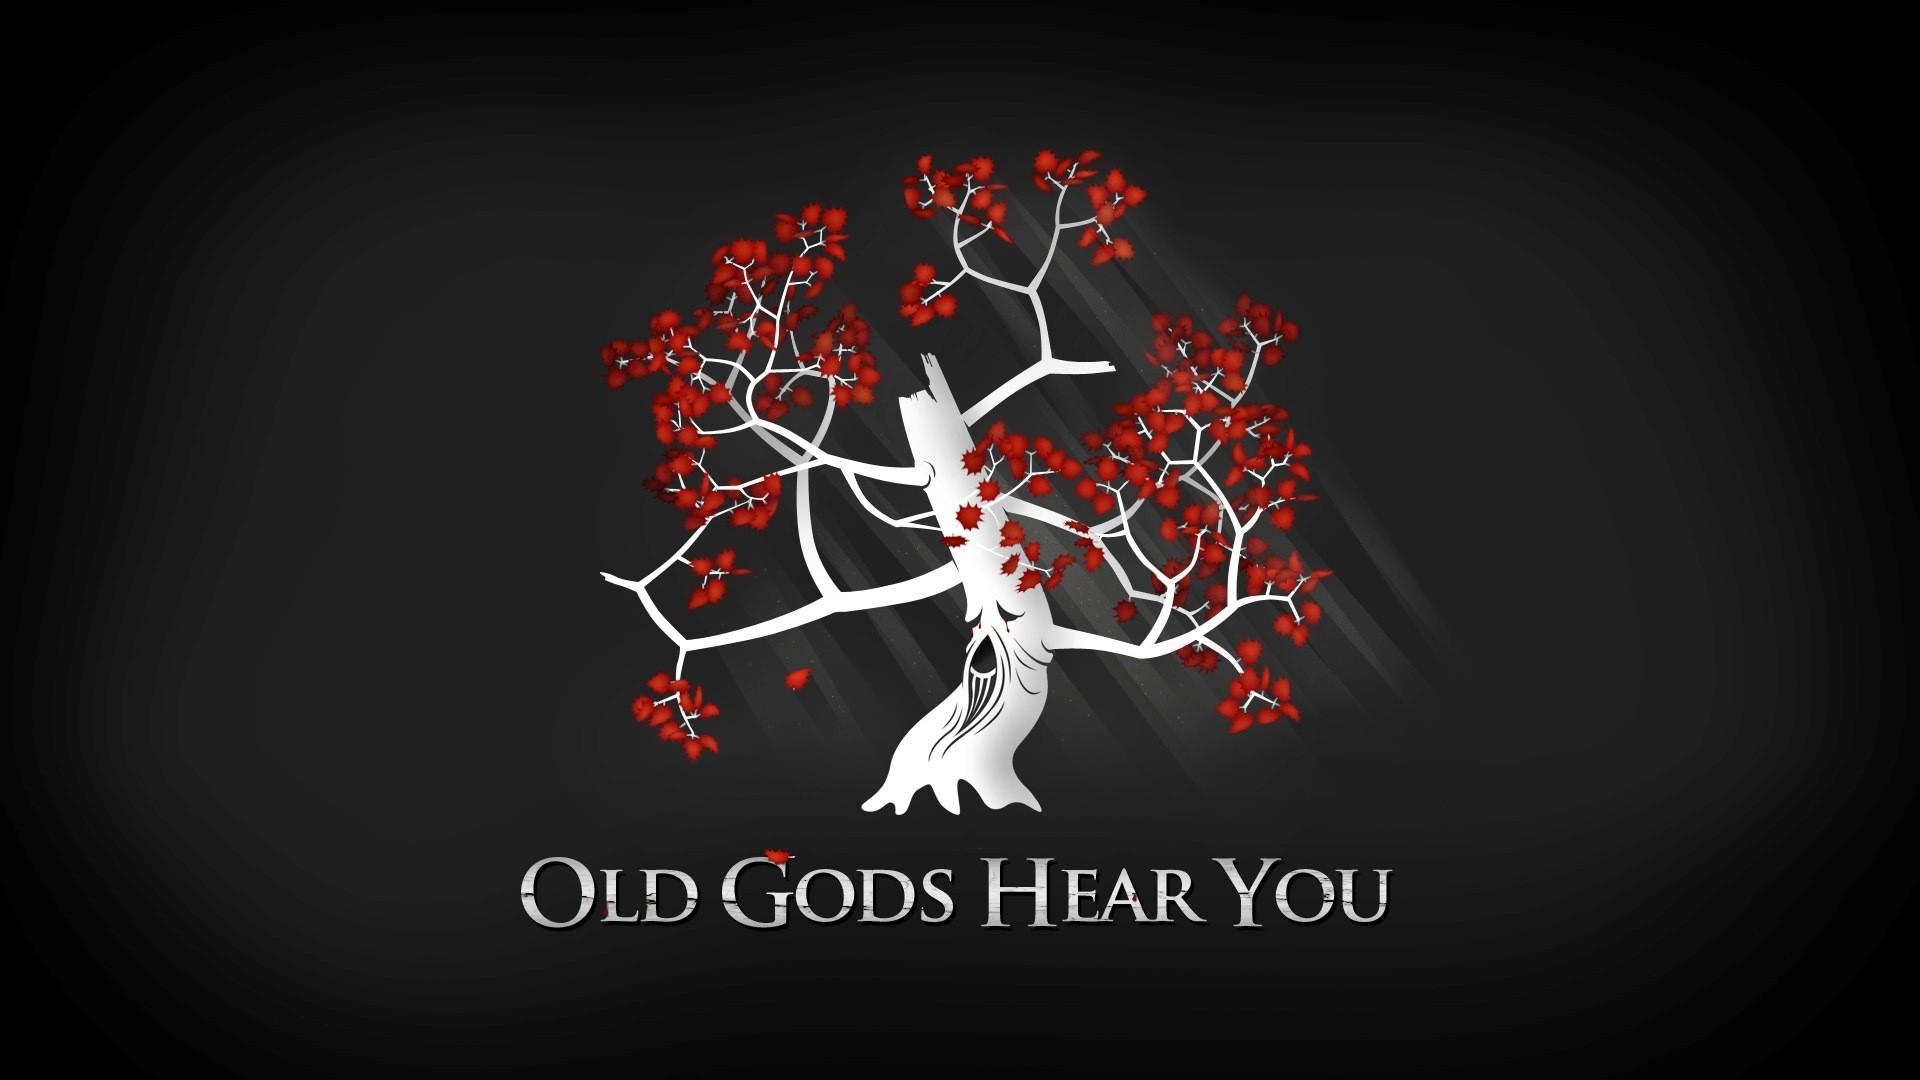 game of thrones old gods hear you desktop wallpaper hd